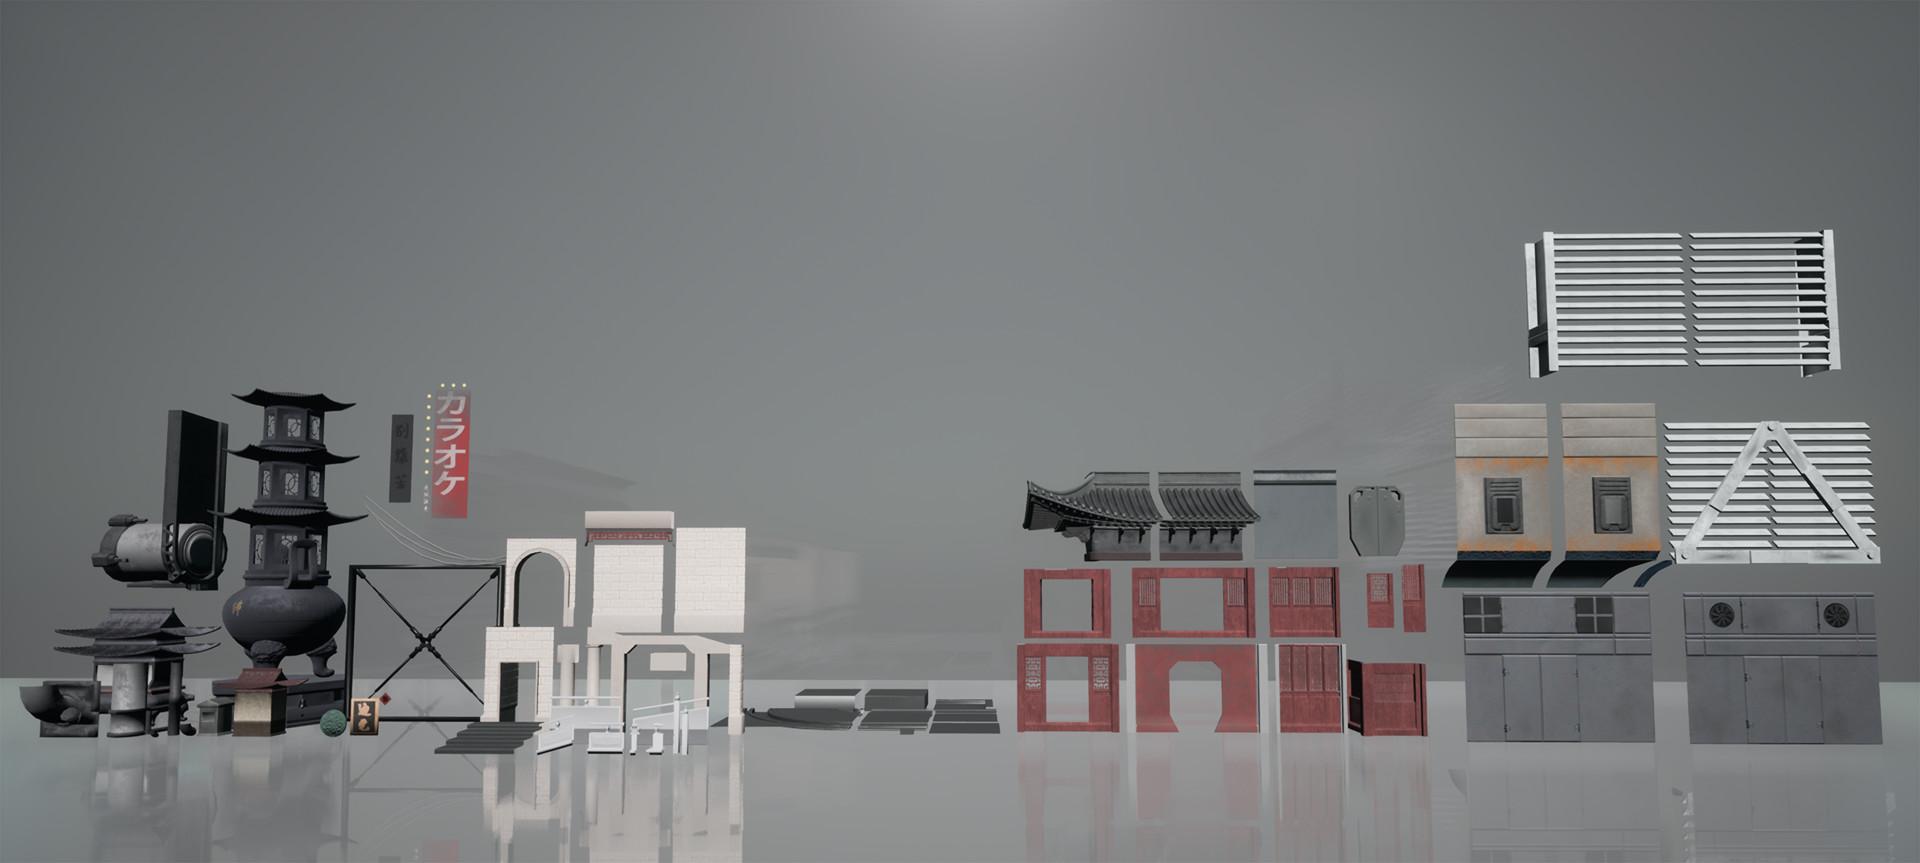 Modkit overview